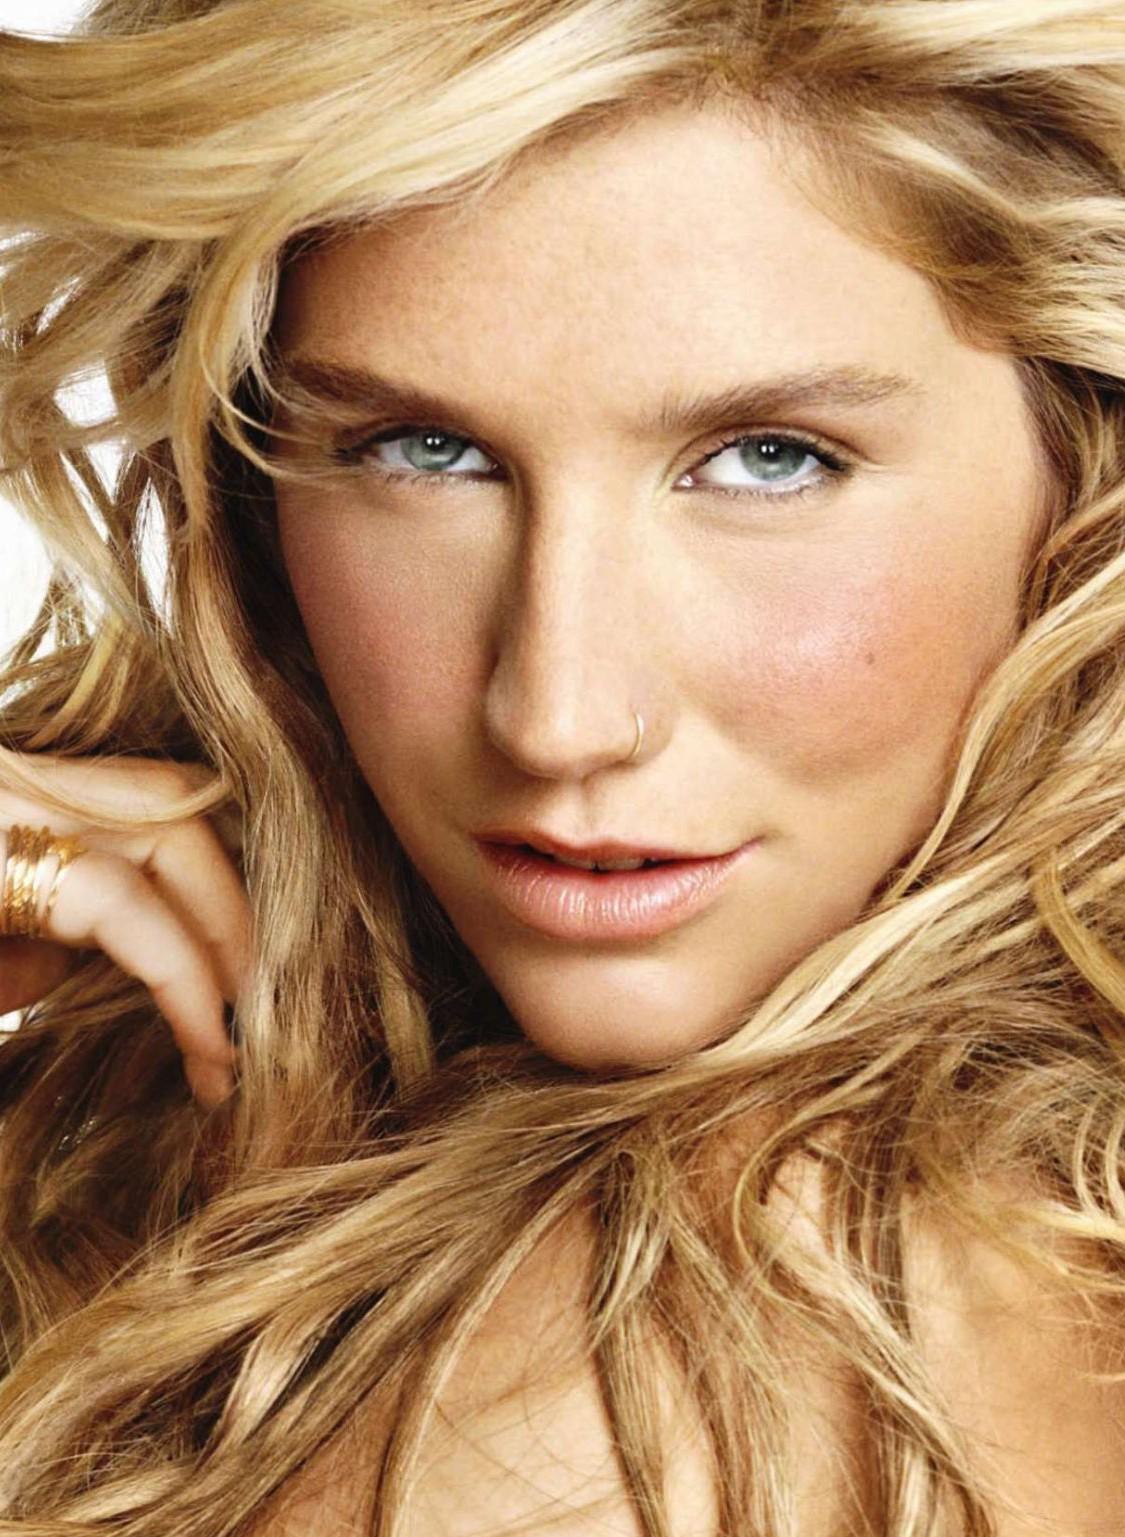 http://1.bp.blogspot.com/-8XyQRbcPsBc/TxgJLGrDvII/AAAAAAAABcM/wiTRkyRUtMI/s1600/kesha-rose-sebert-New-Hair-Styles.jpg